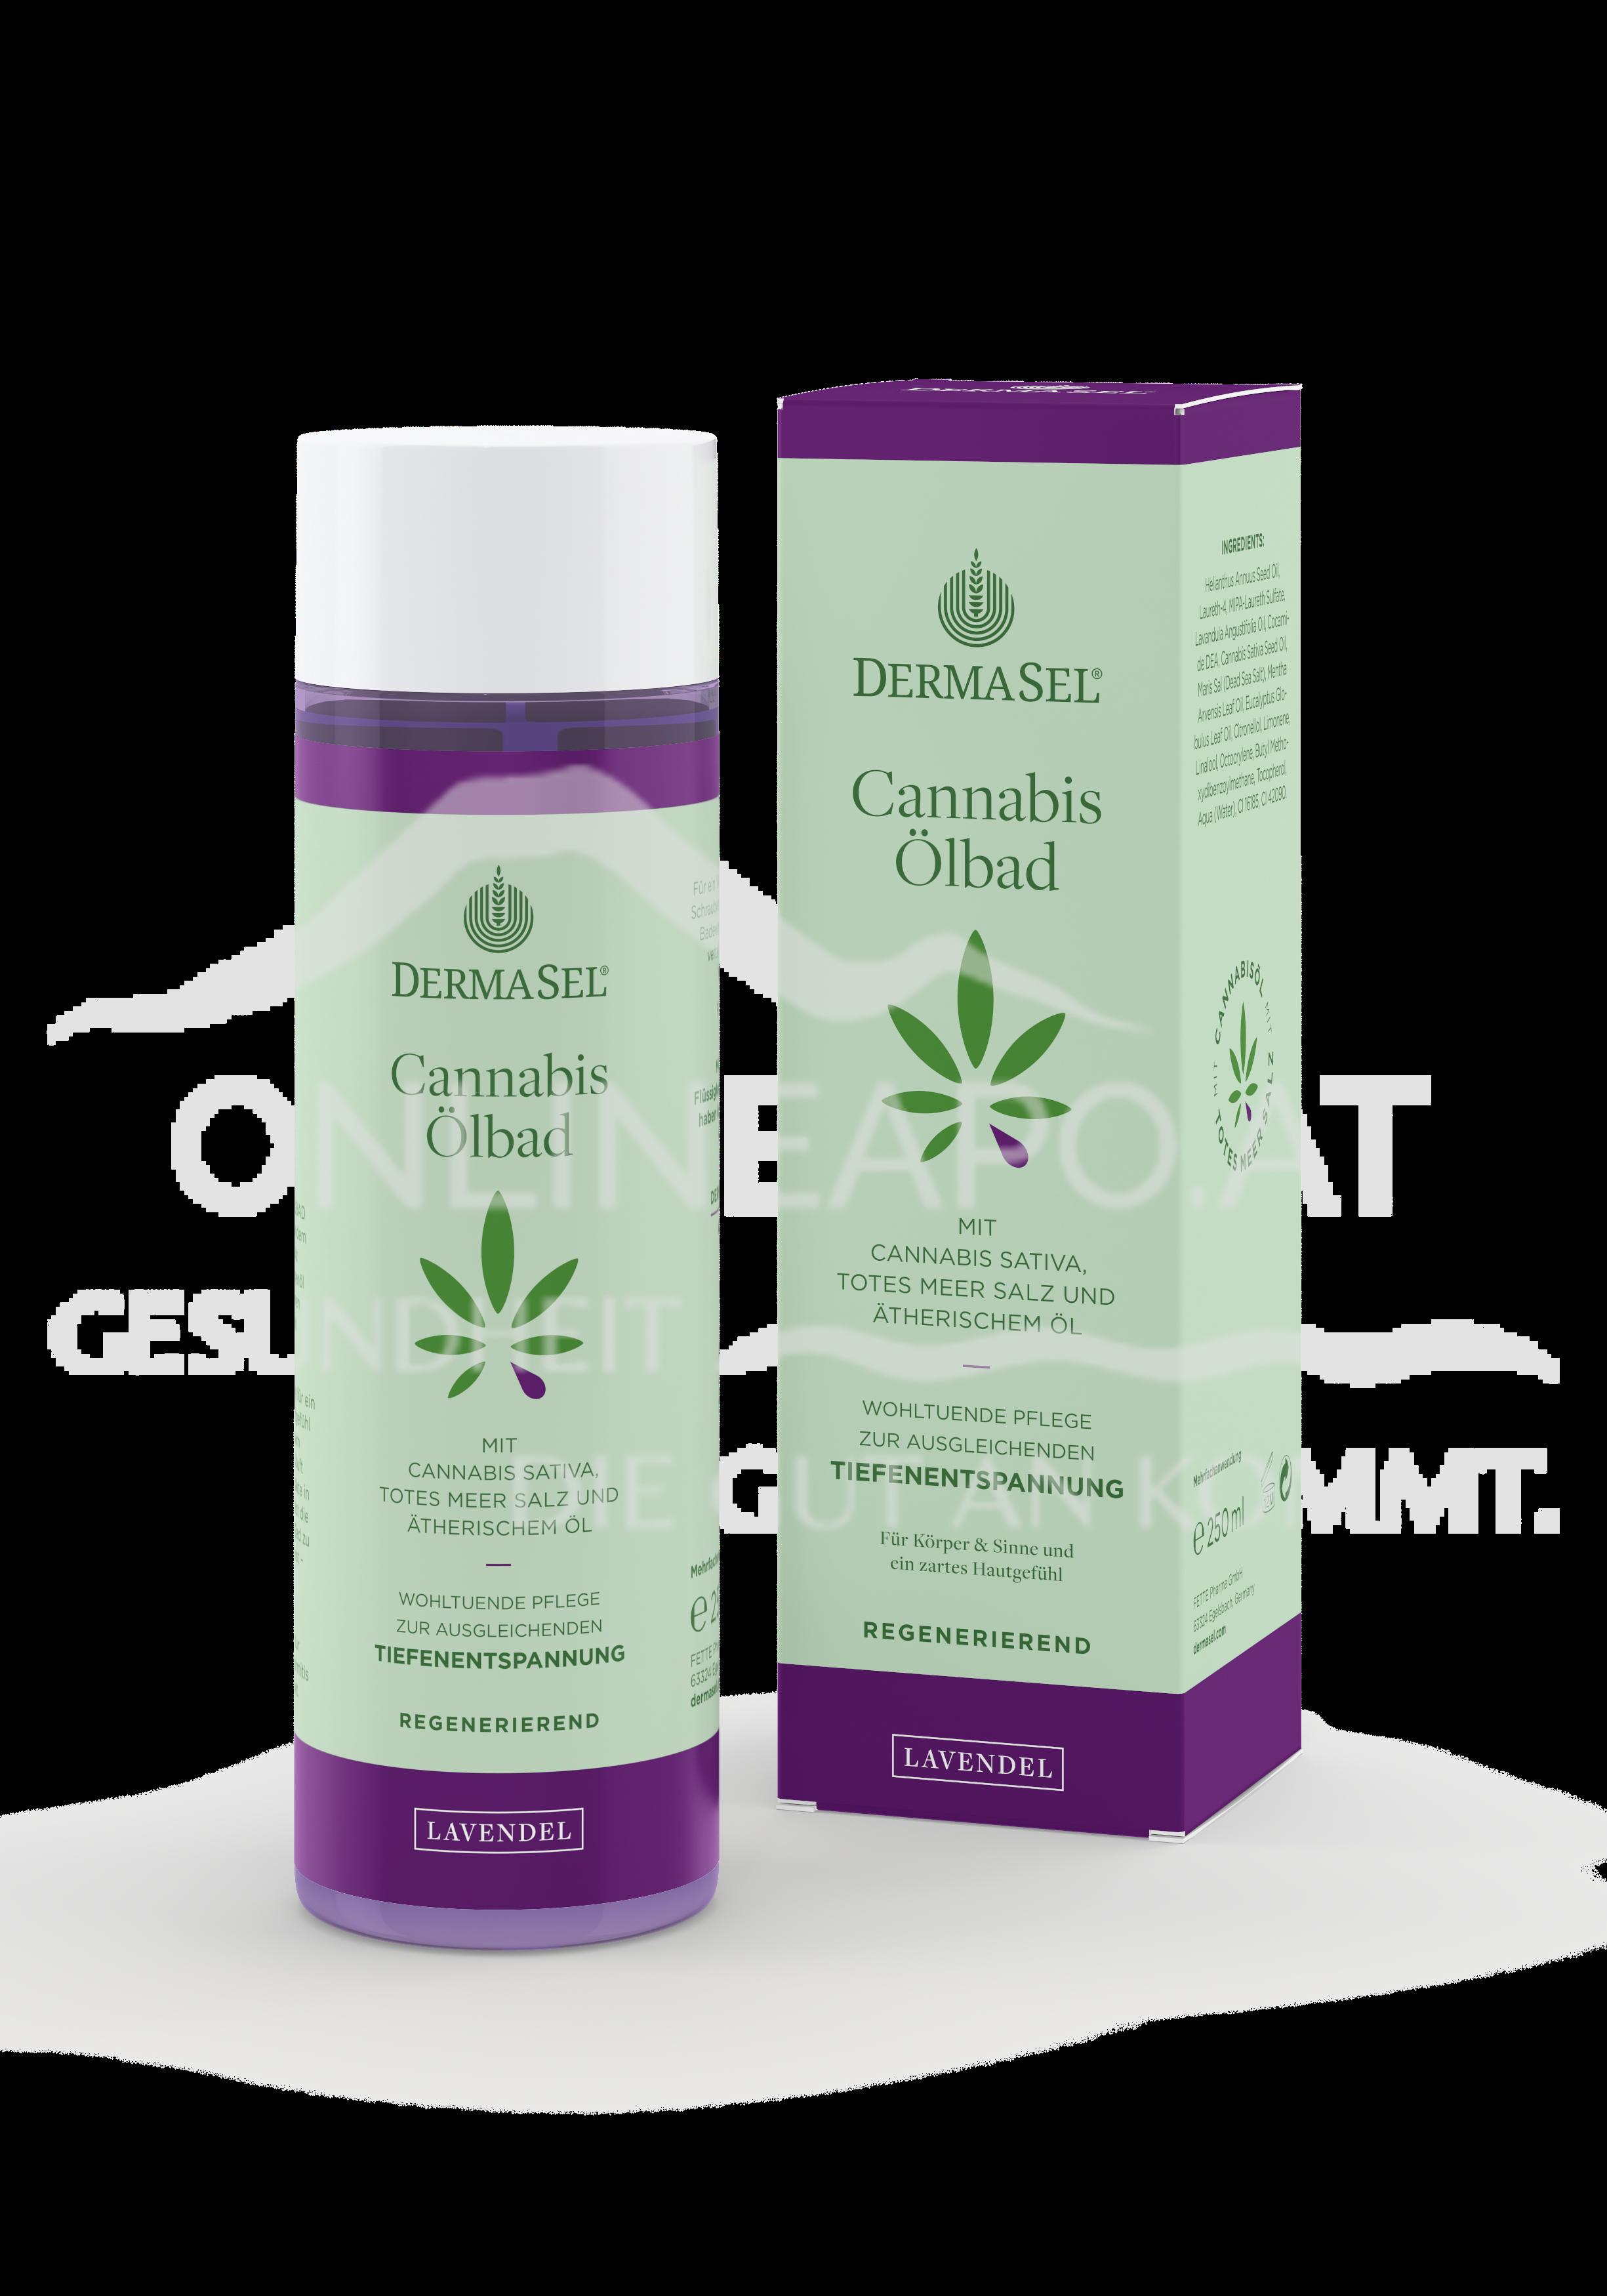 DermaSel® Cannabis Ölbad Lavendel